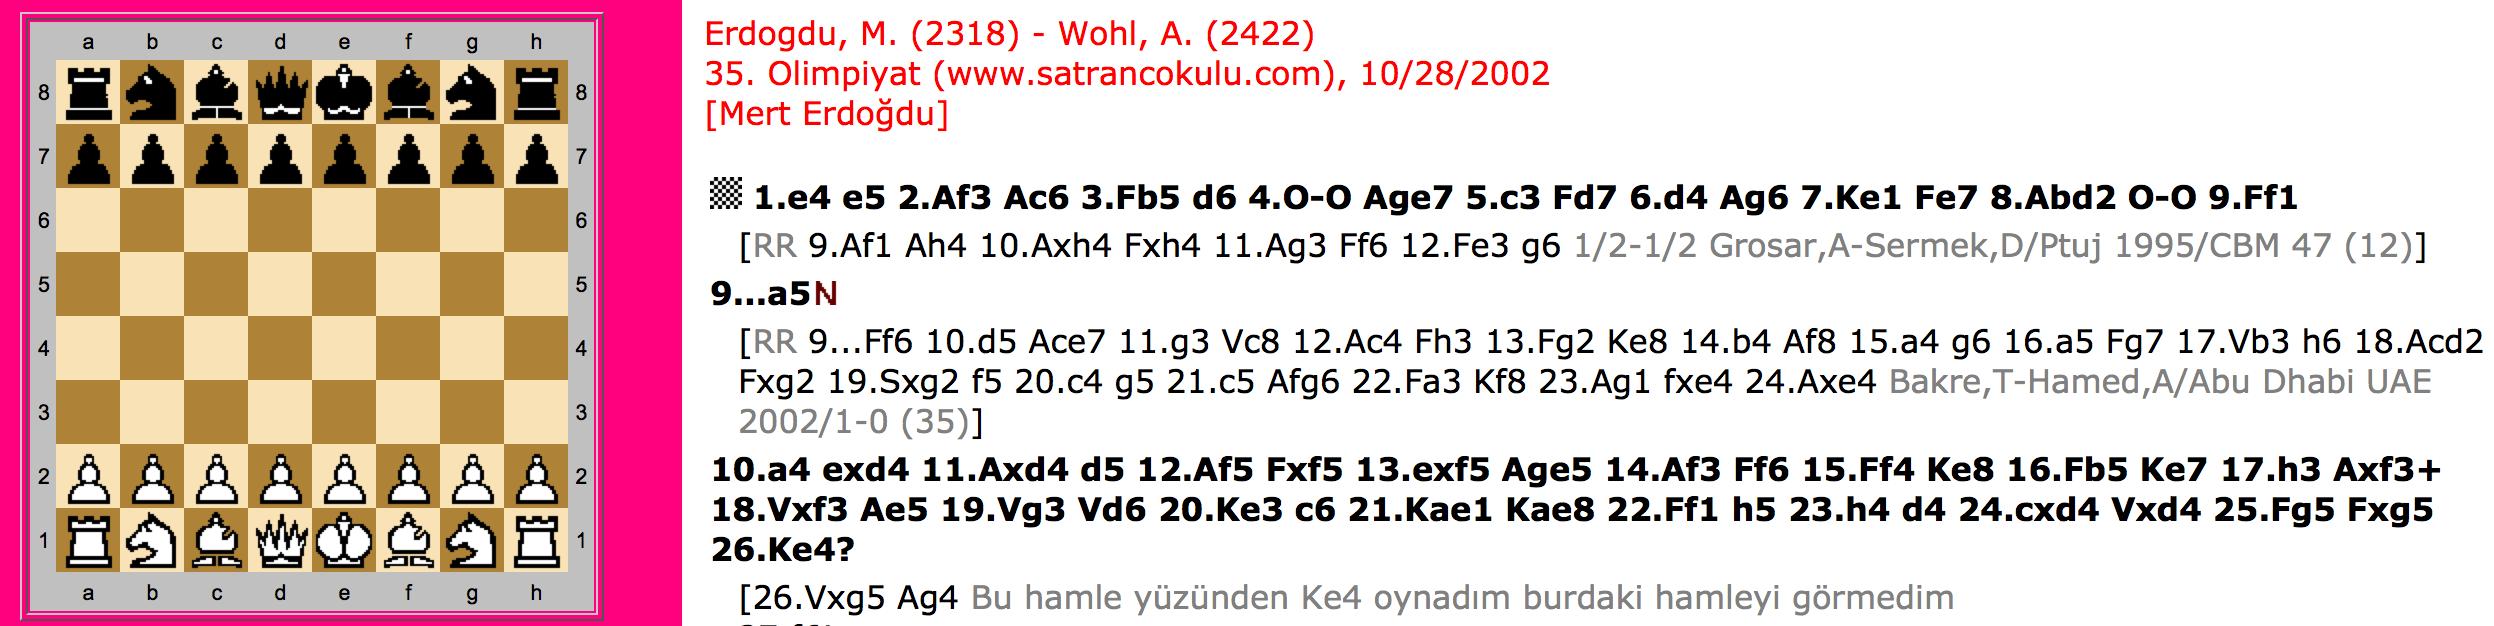 Erdoğdu – Wohl 2002